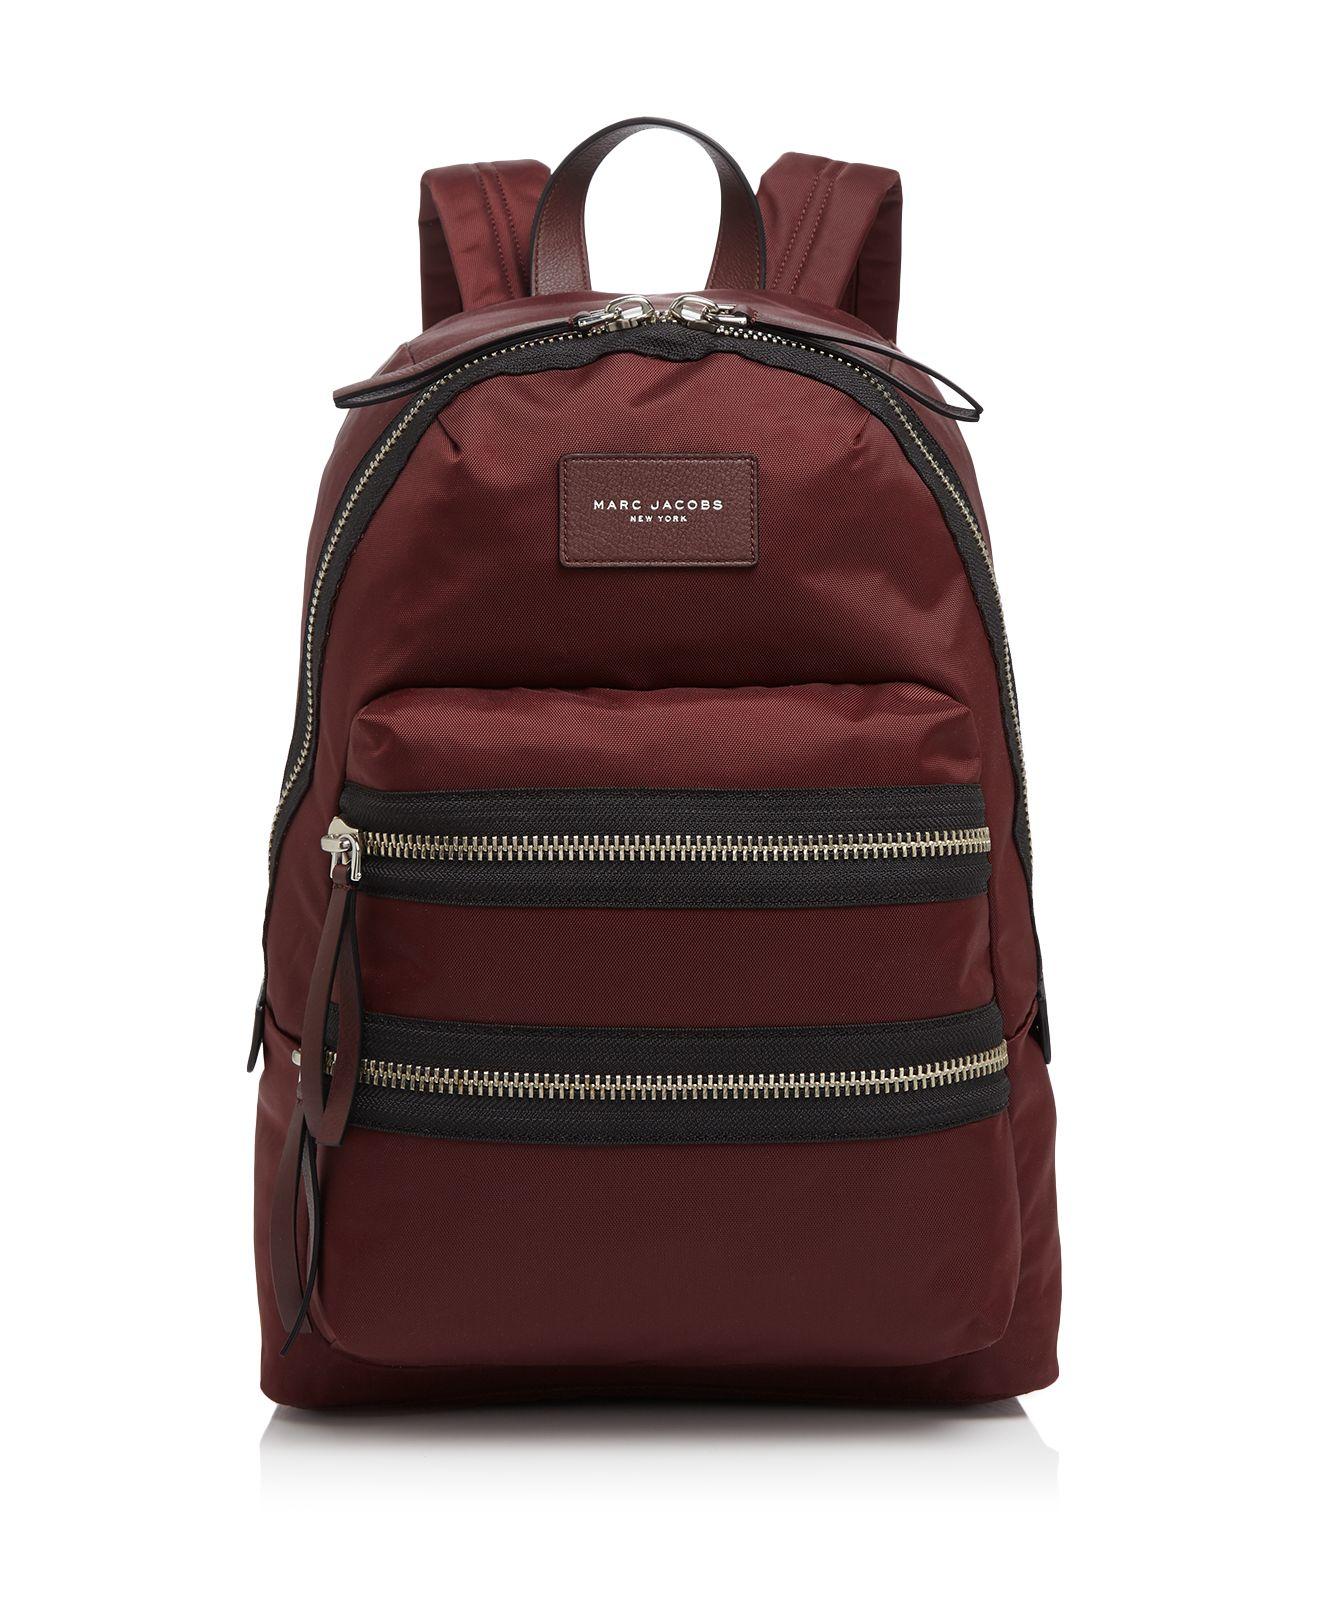 marc jacobs nylon biker backpack in red rubino lyst. Black Bedroom Furniture Sets. Home Design Ideas